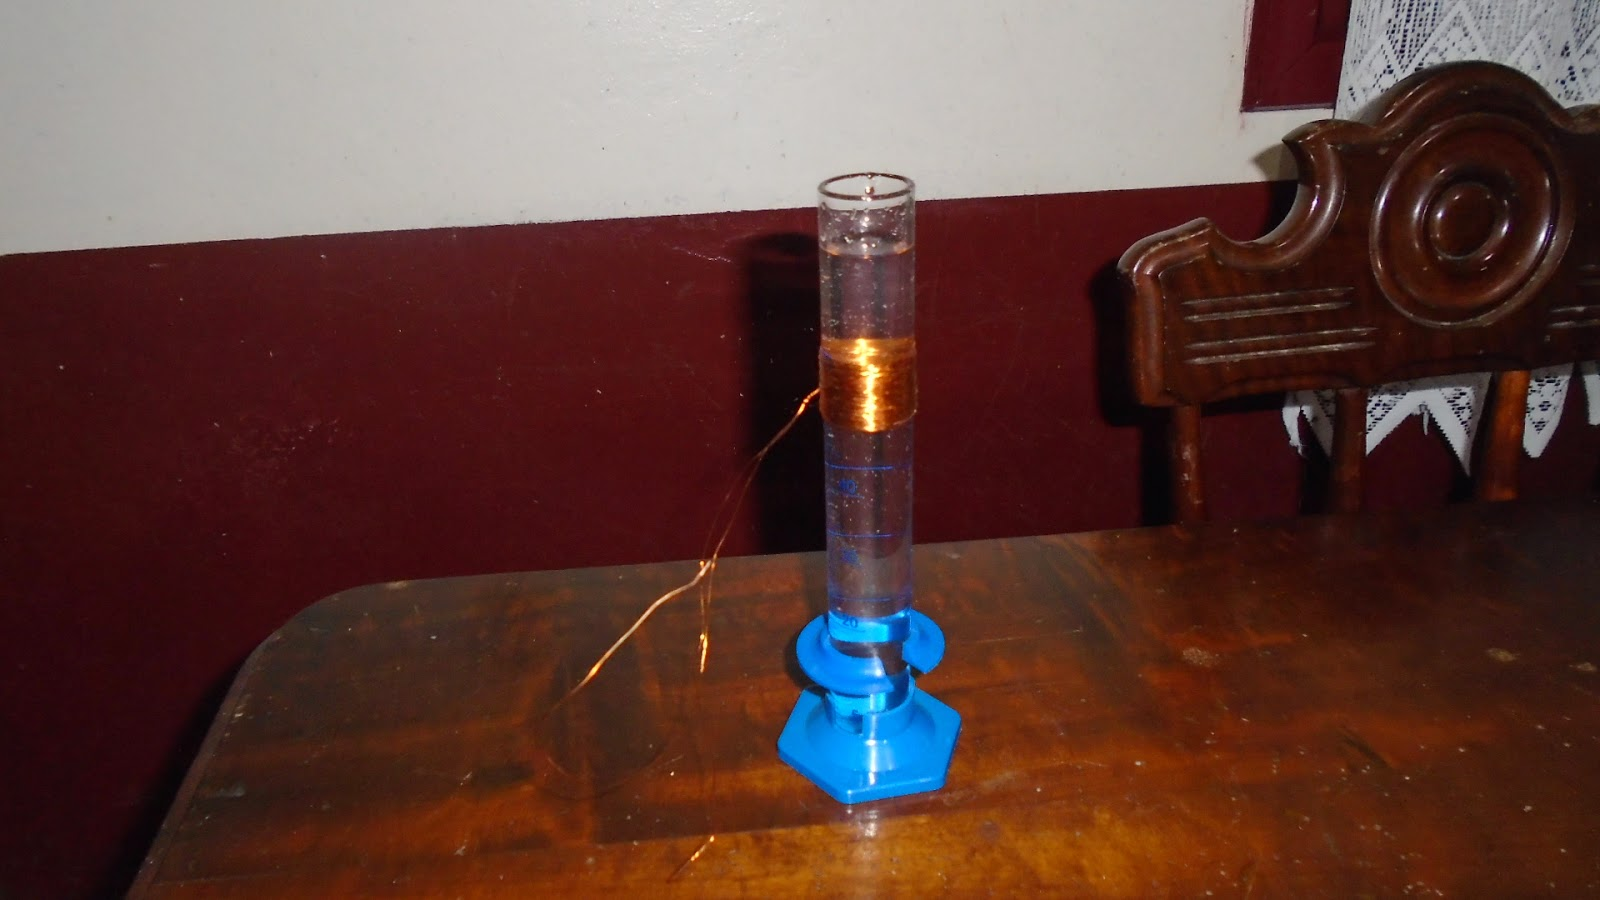 89389b6137a Devemos enrolar o fio de cobre no tubo de ensaio